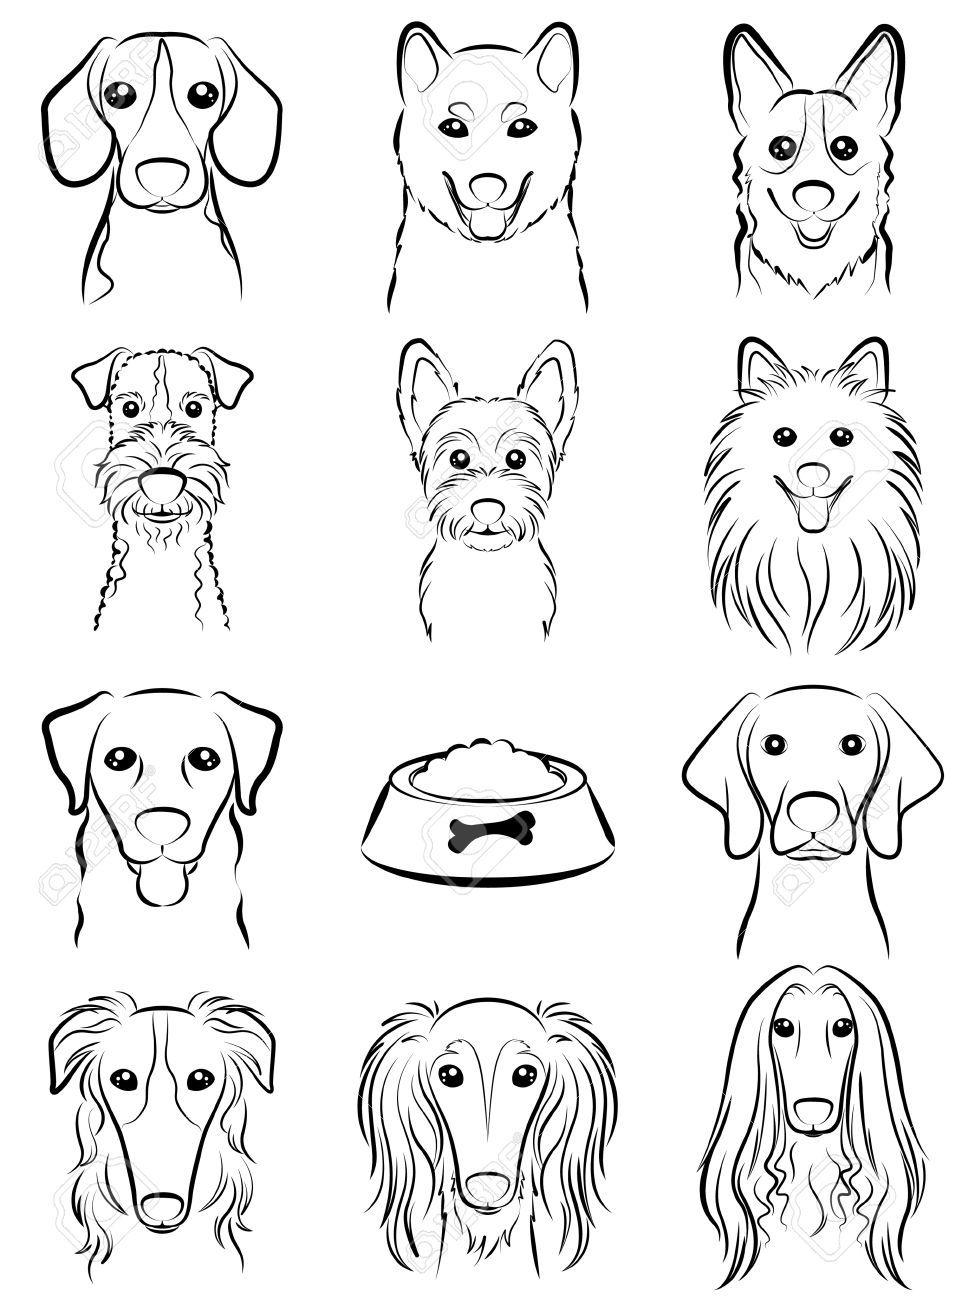 Dog Line Drawing Aff Dog Line Drawing Dog Line Drawing